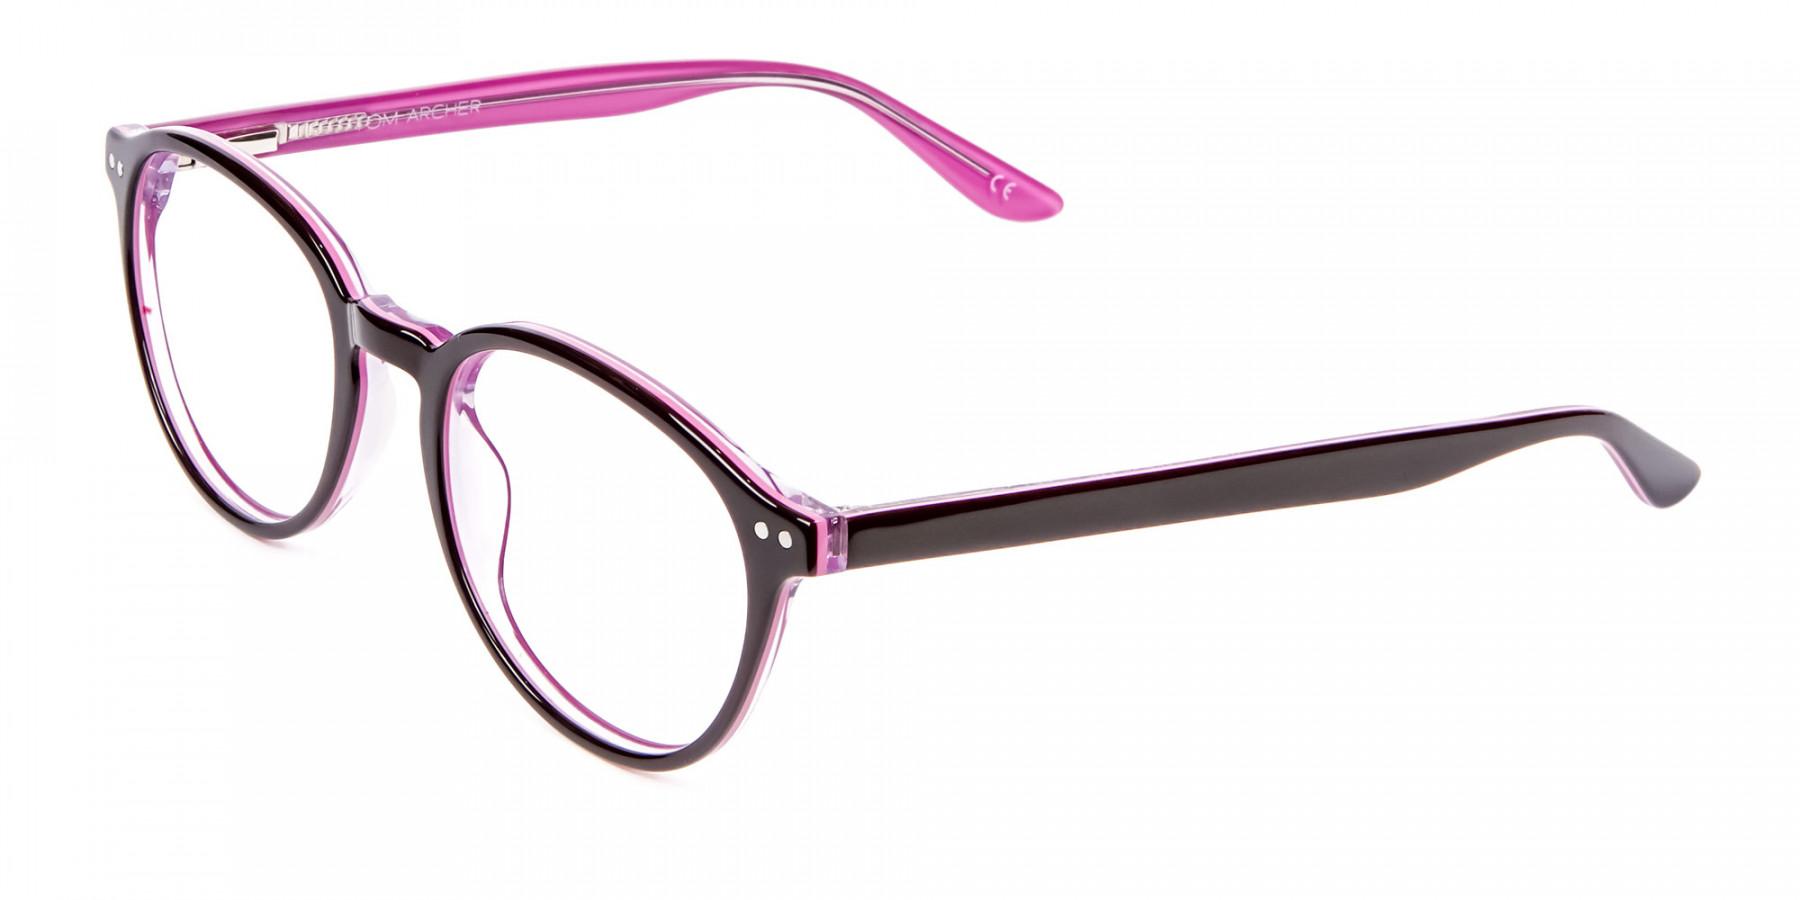 Ladies' Pink Round Glasses - 1